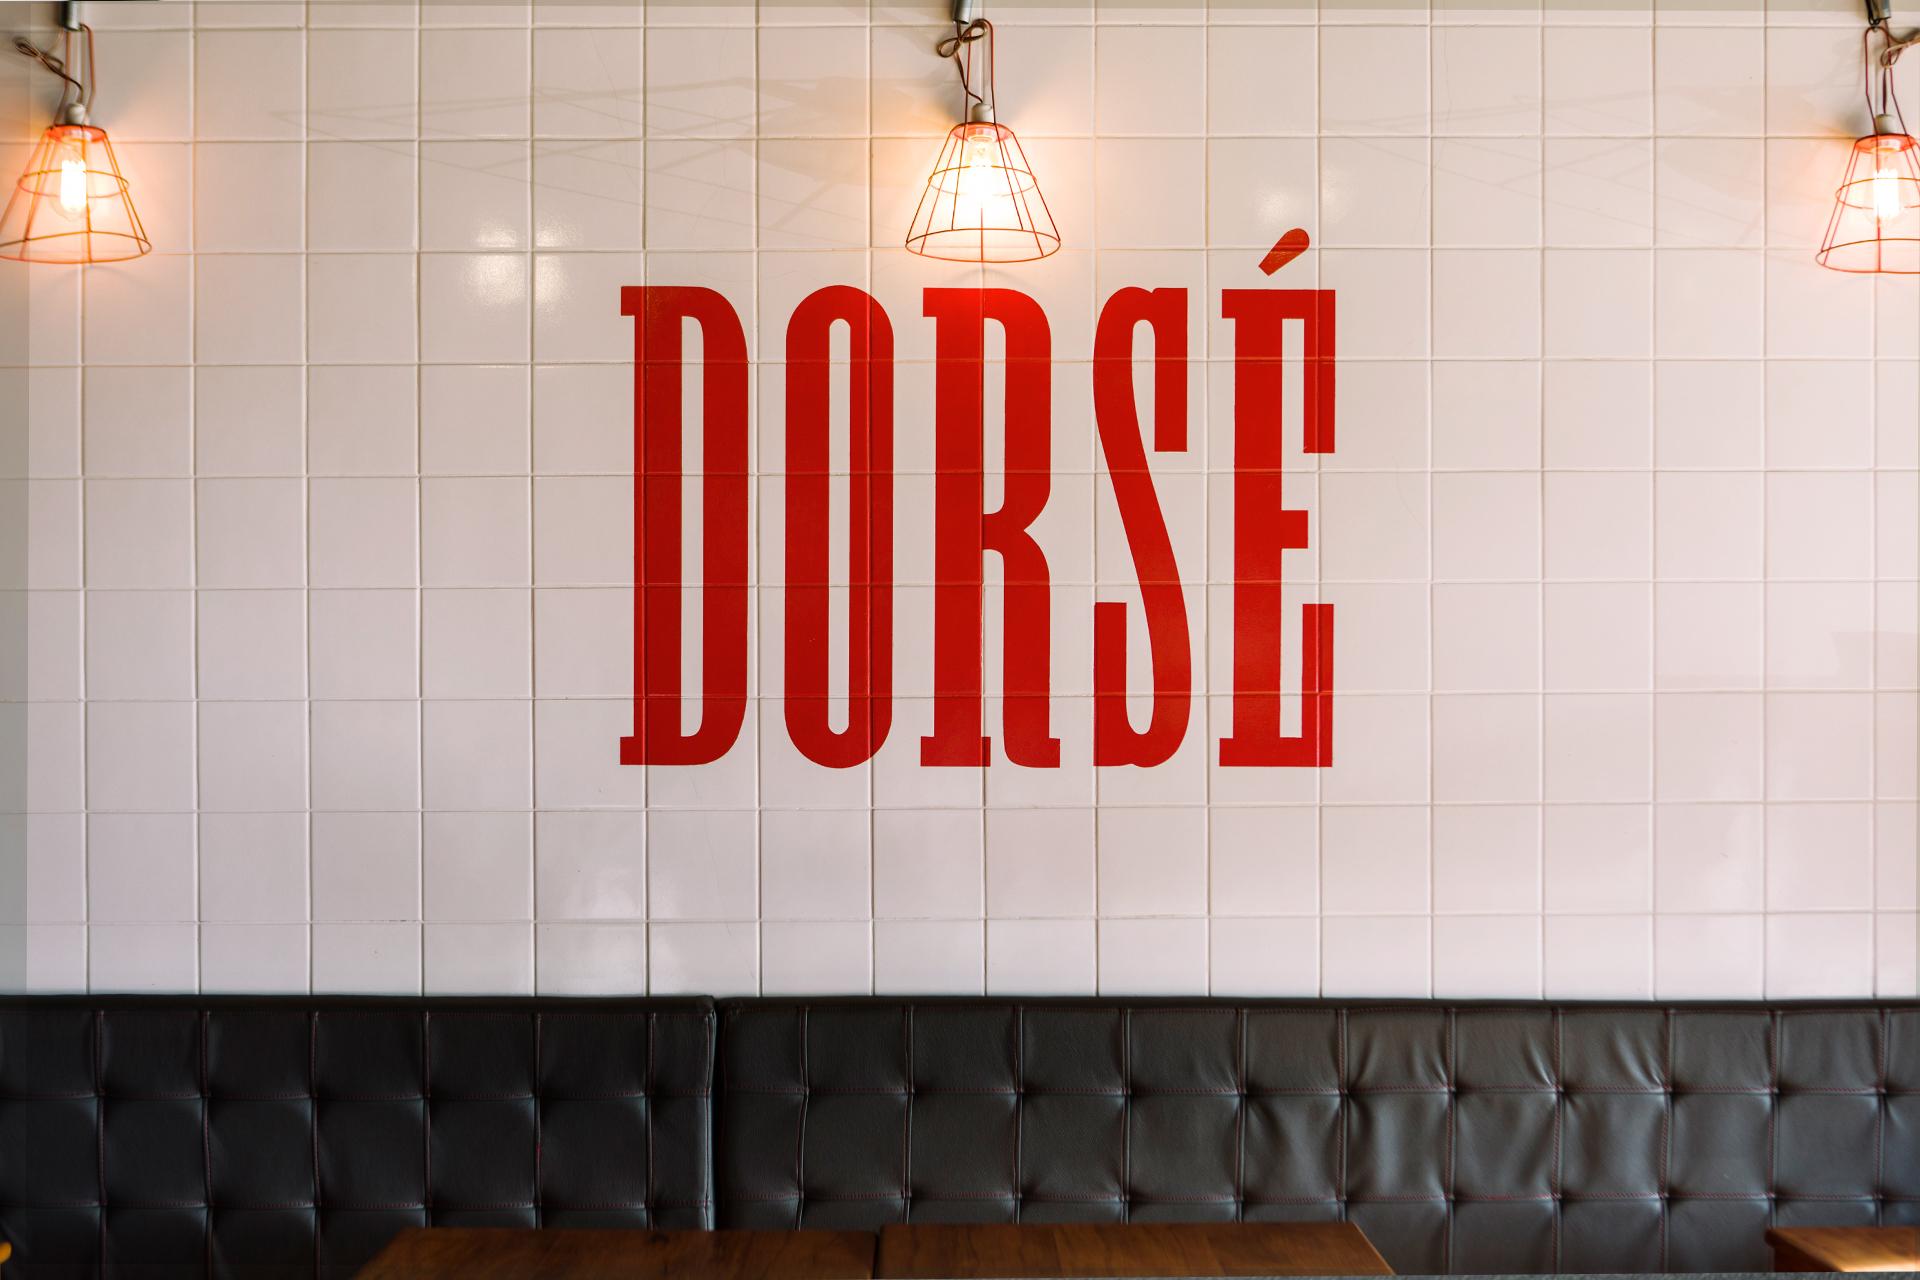 dorse_1.jpg